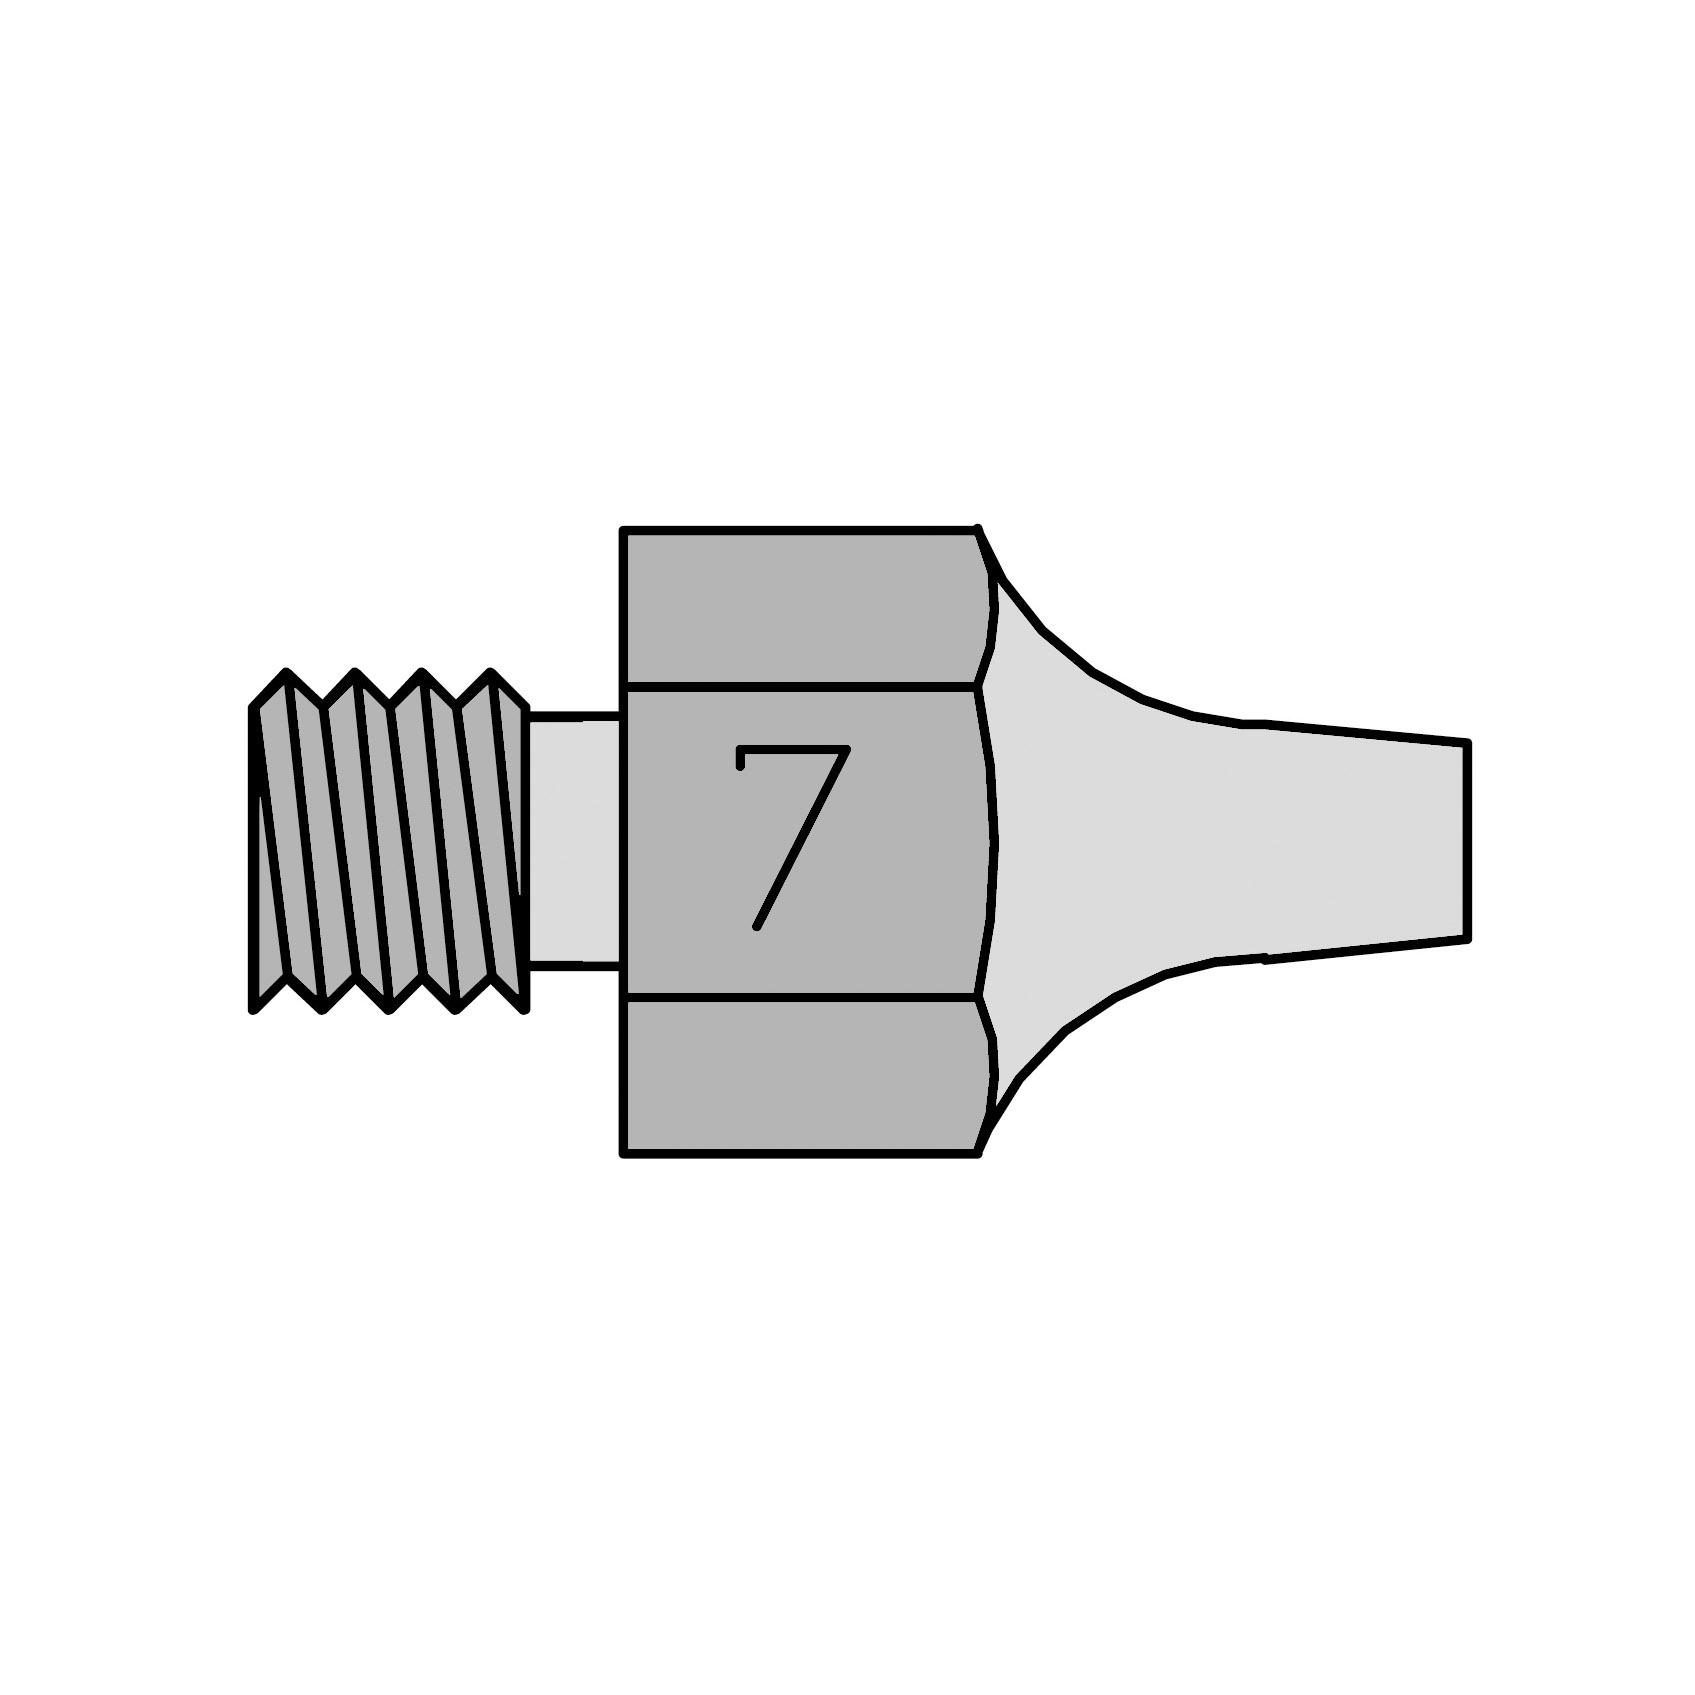 DS 117 Desoldering nozzle